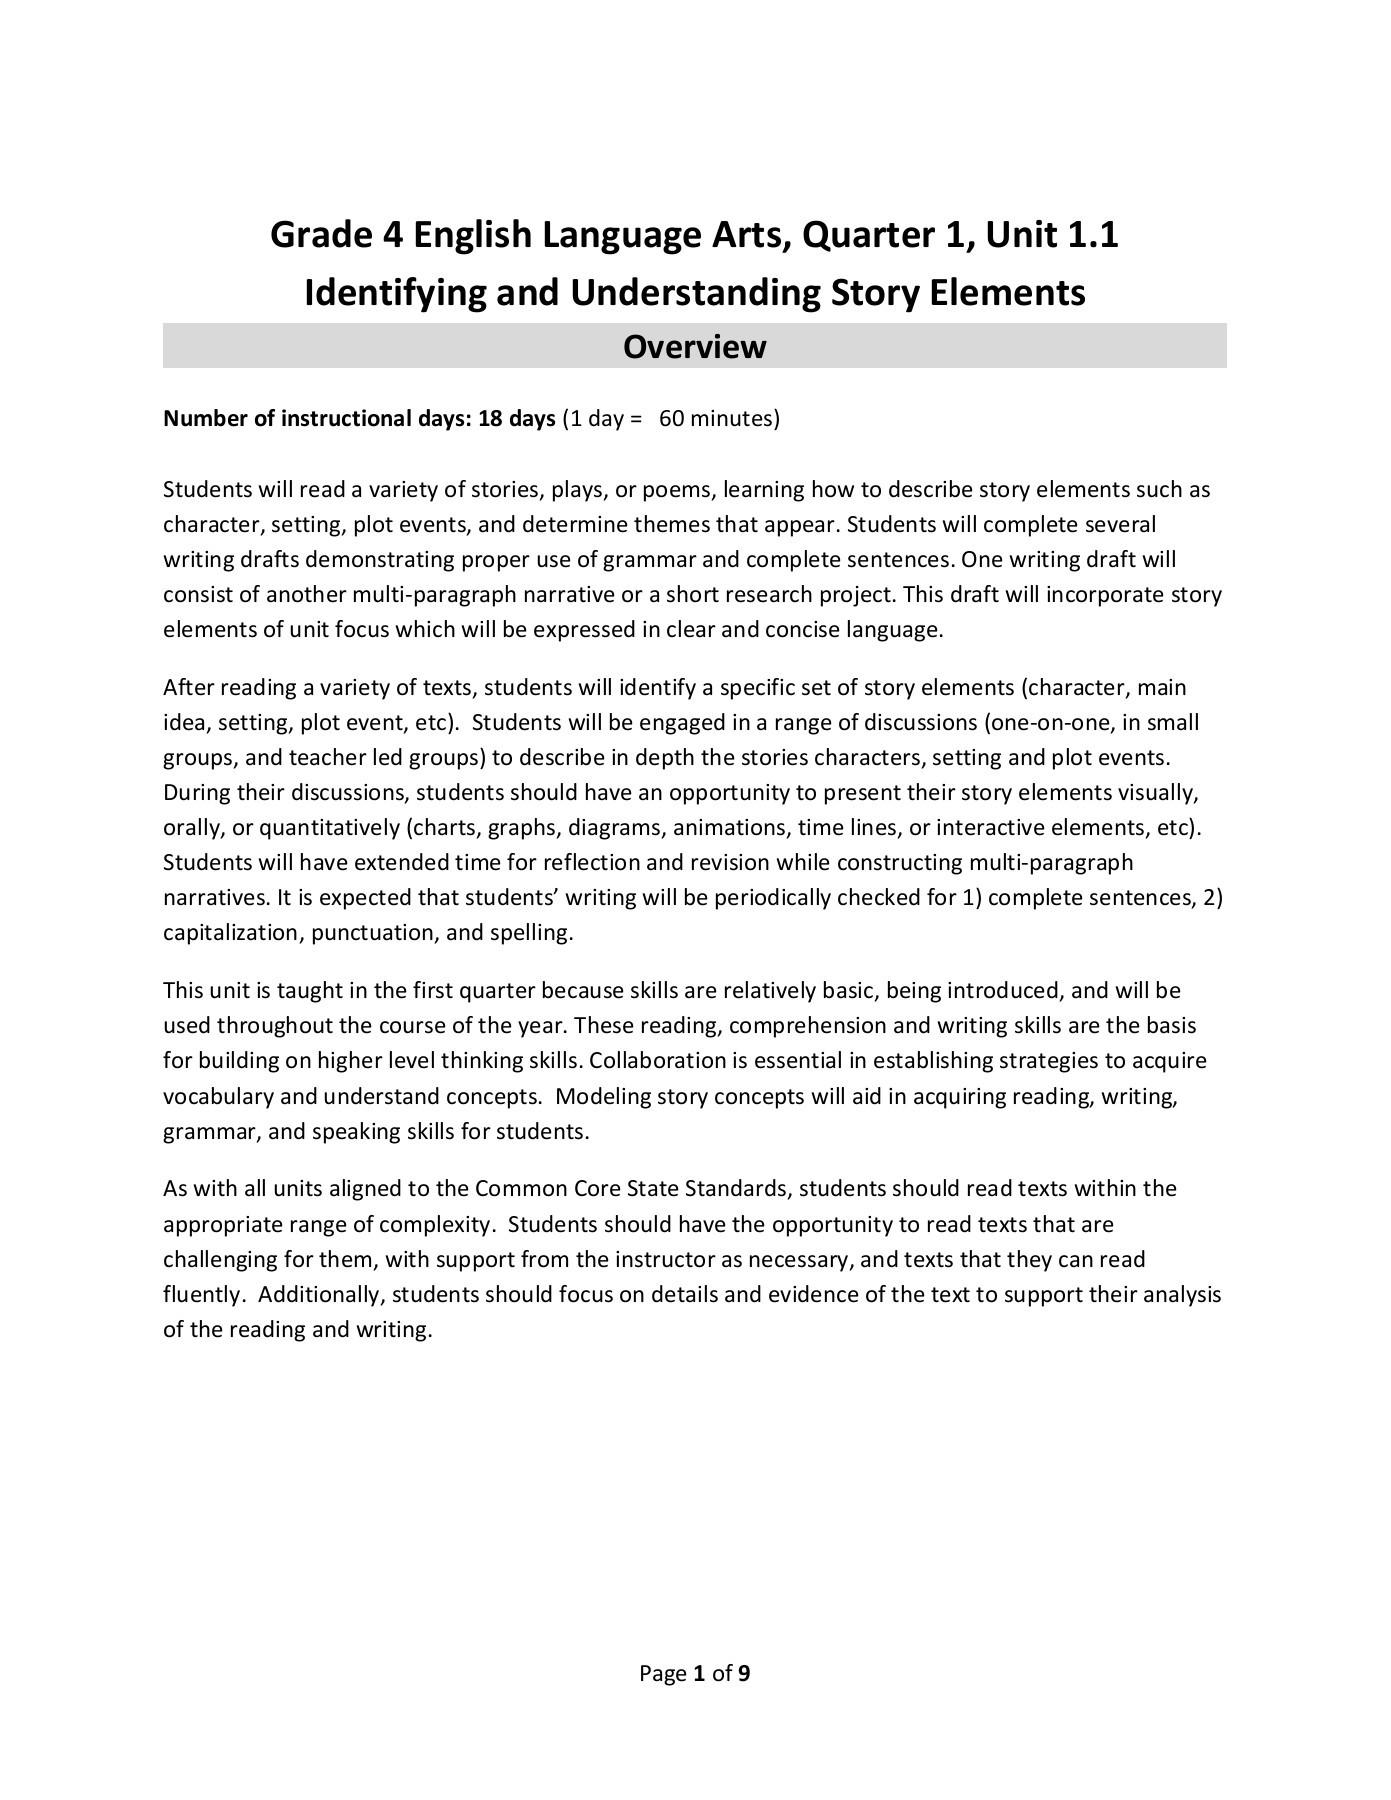 Storytown Fourth Grade Lesson 4 Spelling Test